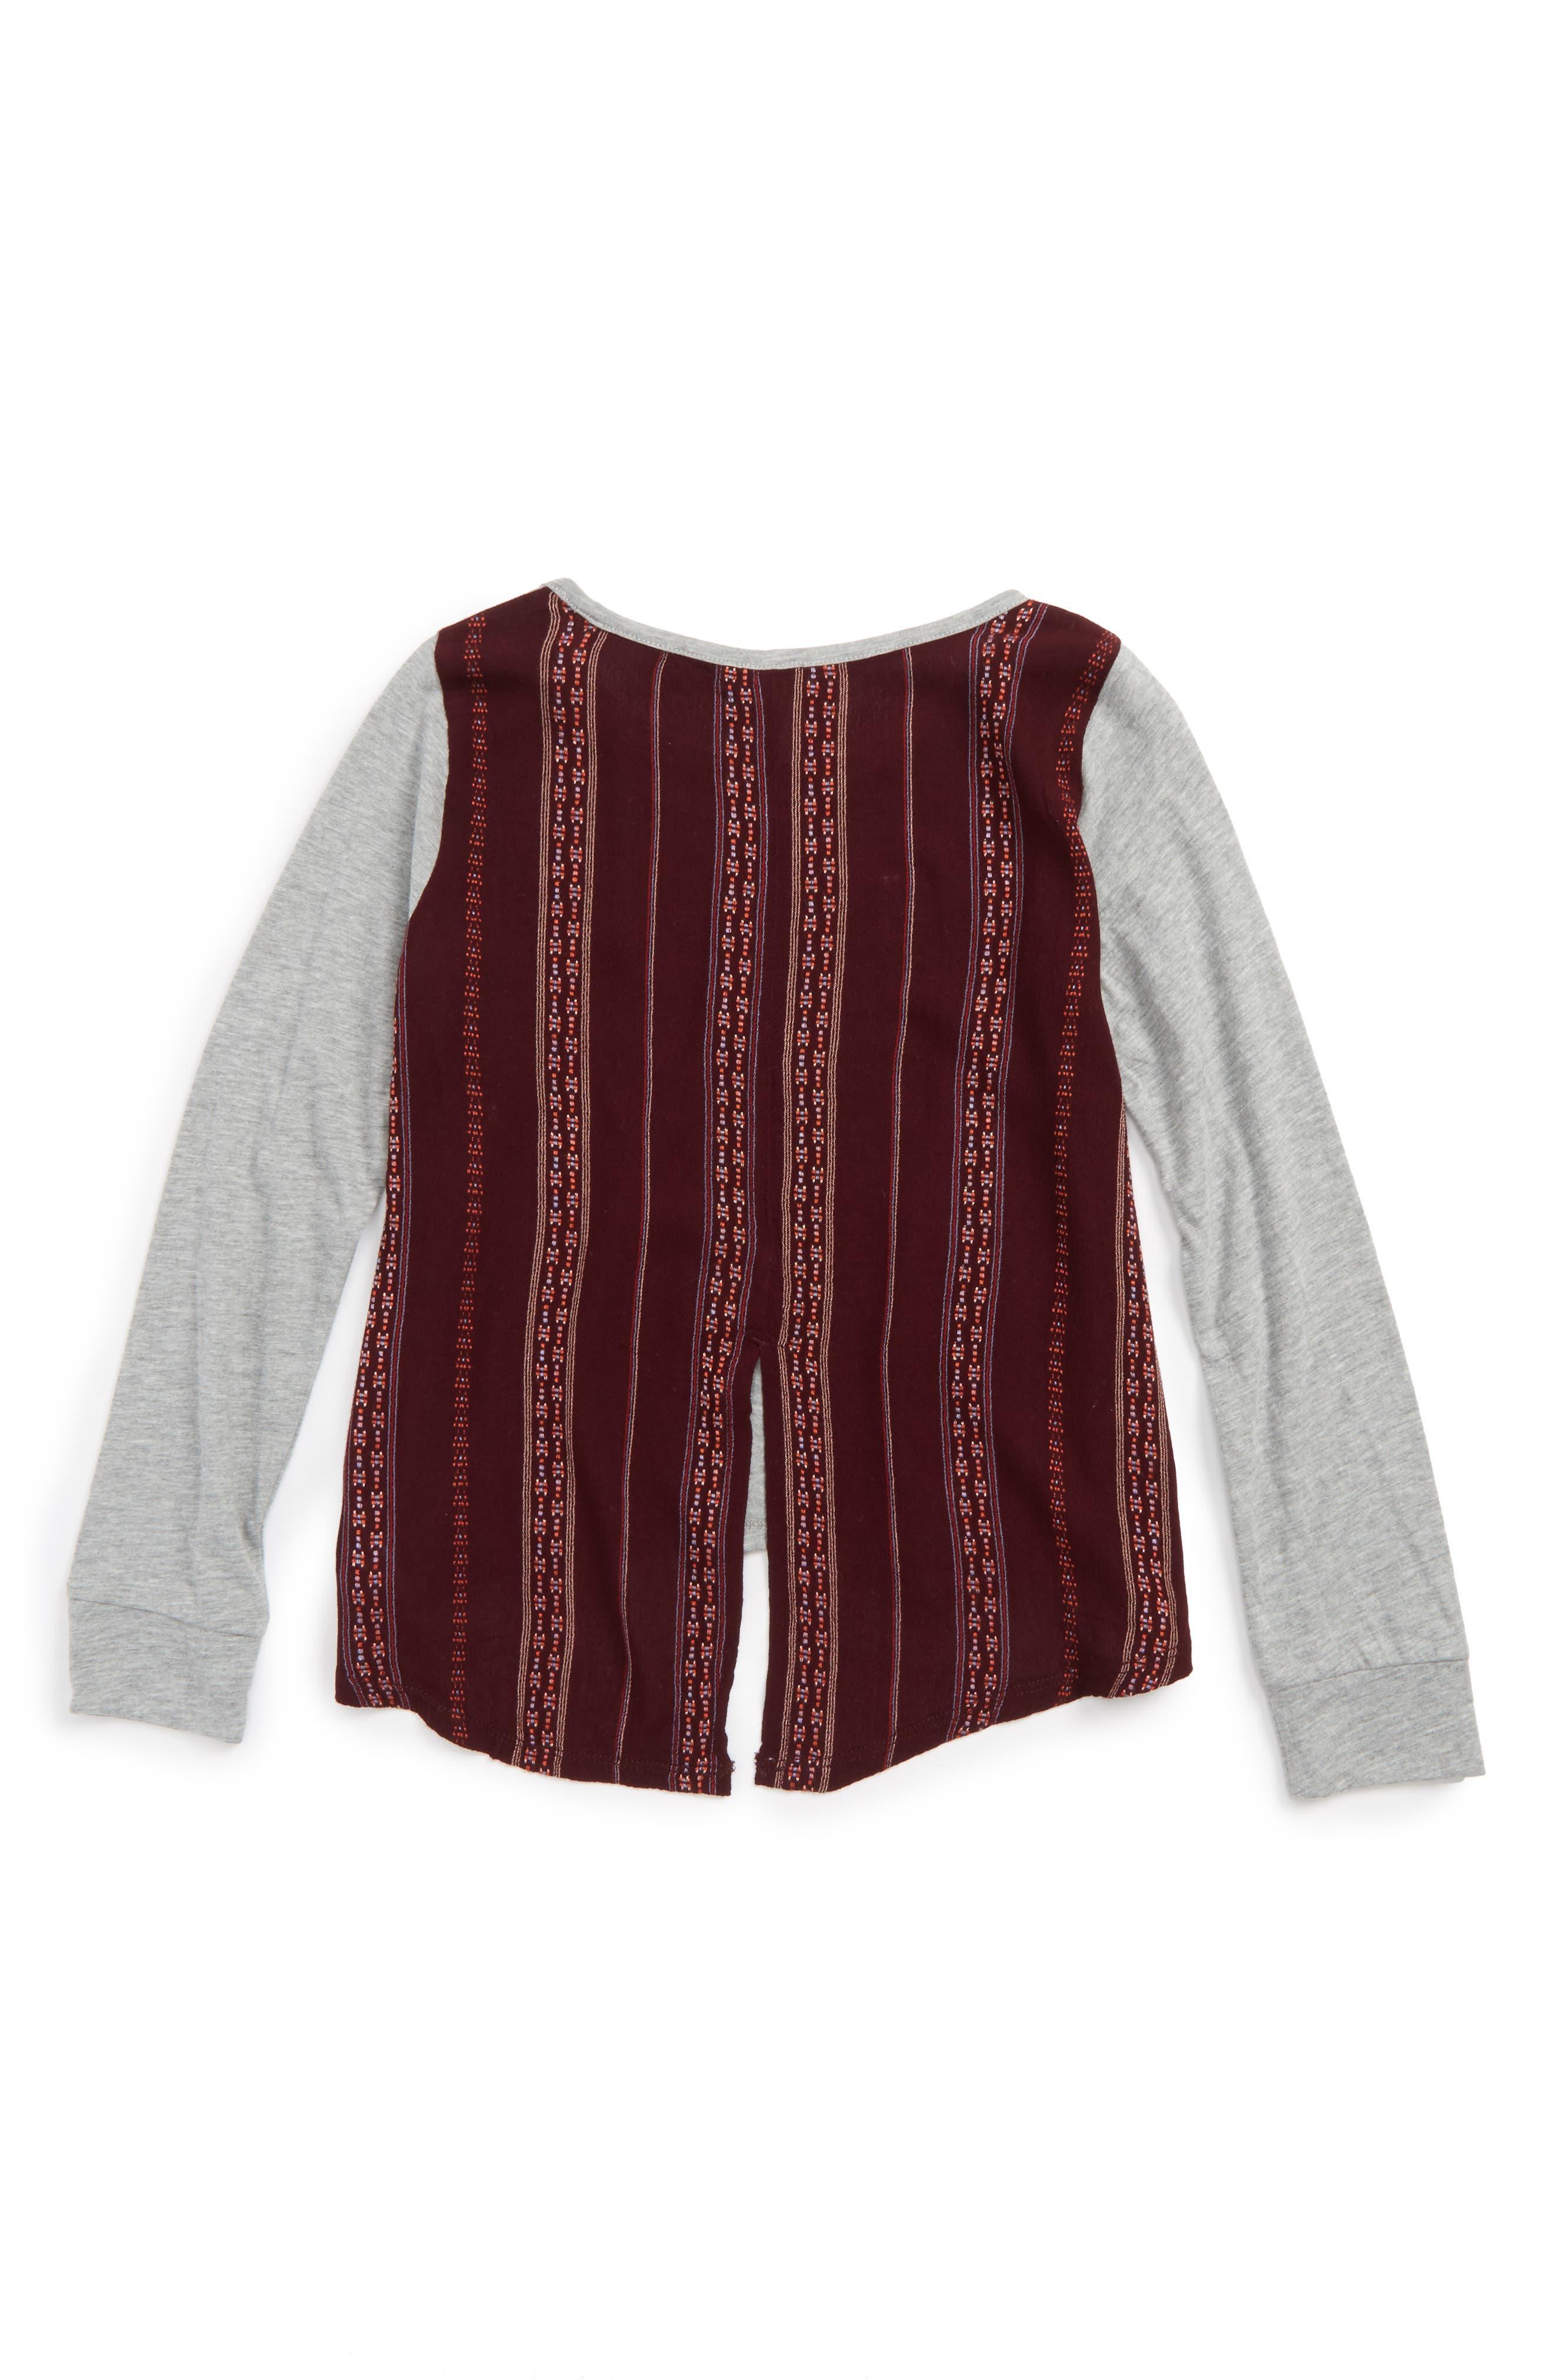 Alternate Image 2  - Tucker + Tate Embroidered Back Shirt (Big Girls)